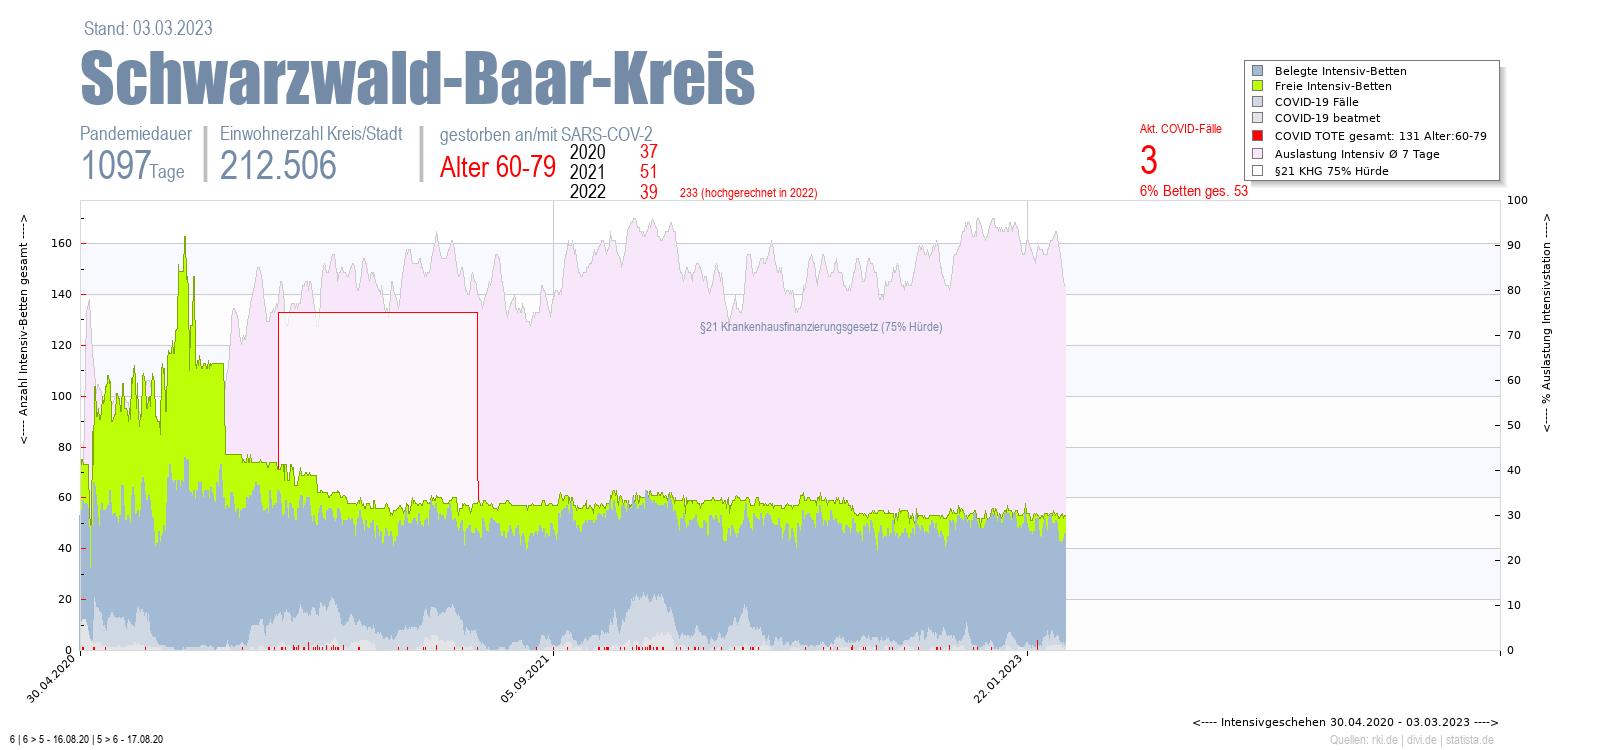 Intensivstation Auslastung Schwarzwald-Baar-Kreis Alter 0-4